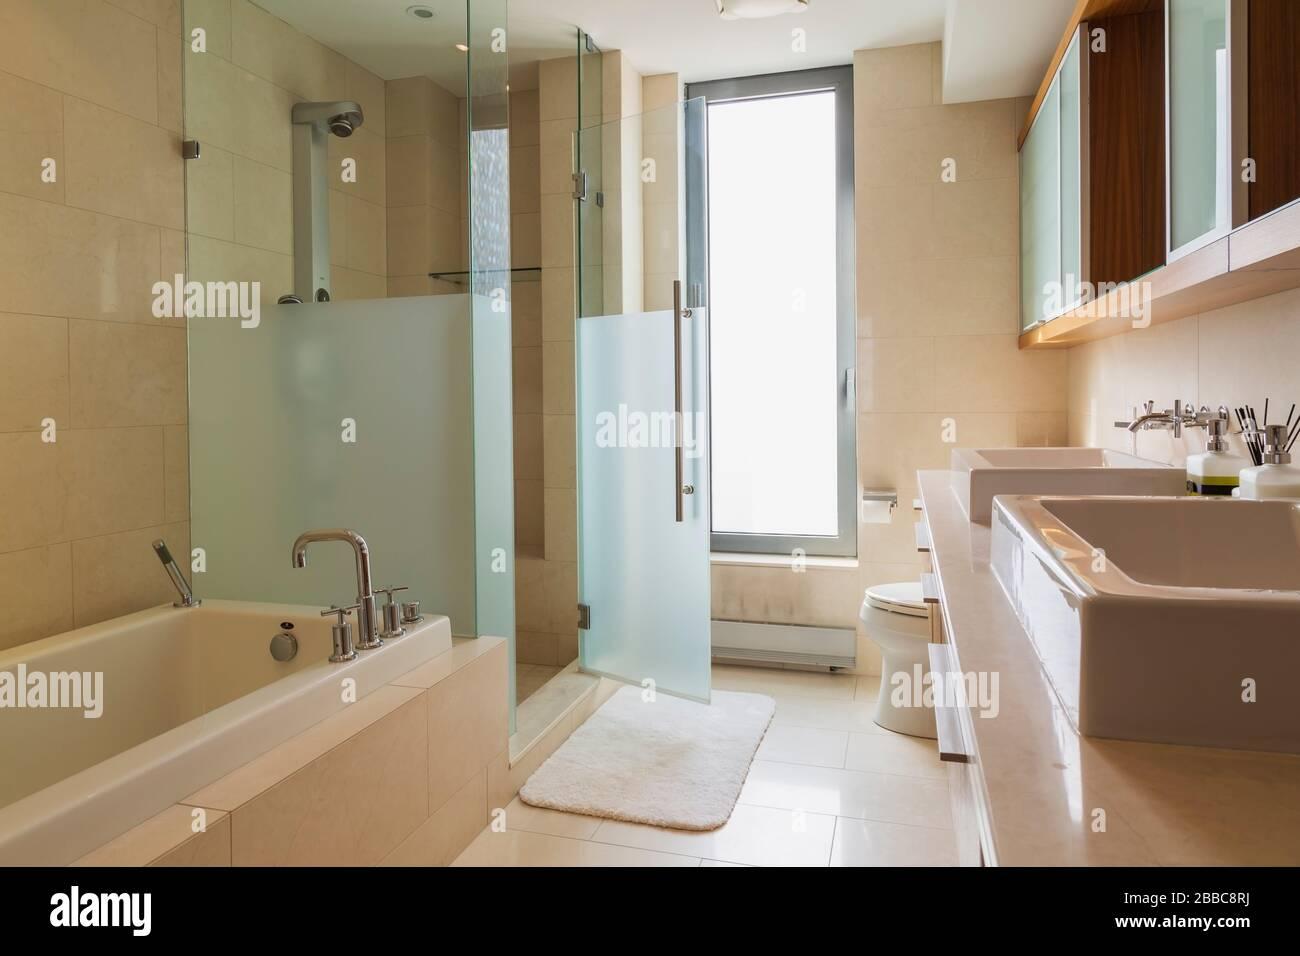 A Bathroom Or Washroom Inside A New Condominium In Downtown Toronto Ontario Canada Stock Photo Alamy